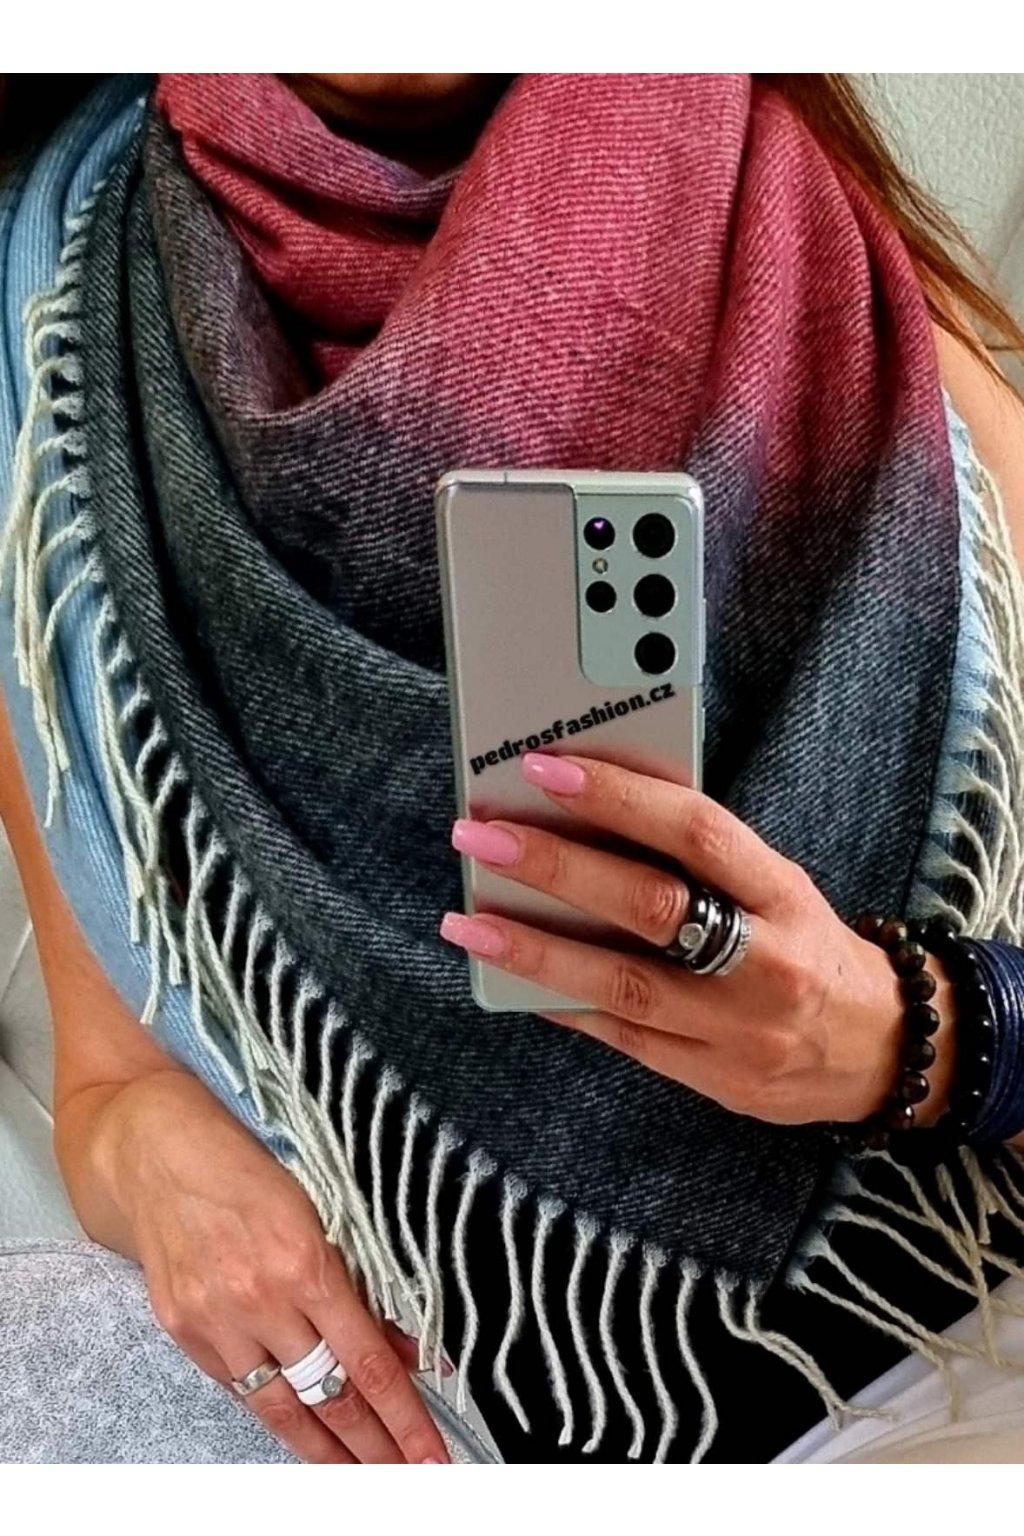 šátek trendy florence černobordomodrý vlna teplý maxi šátek